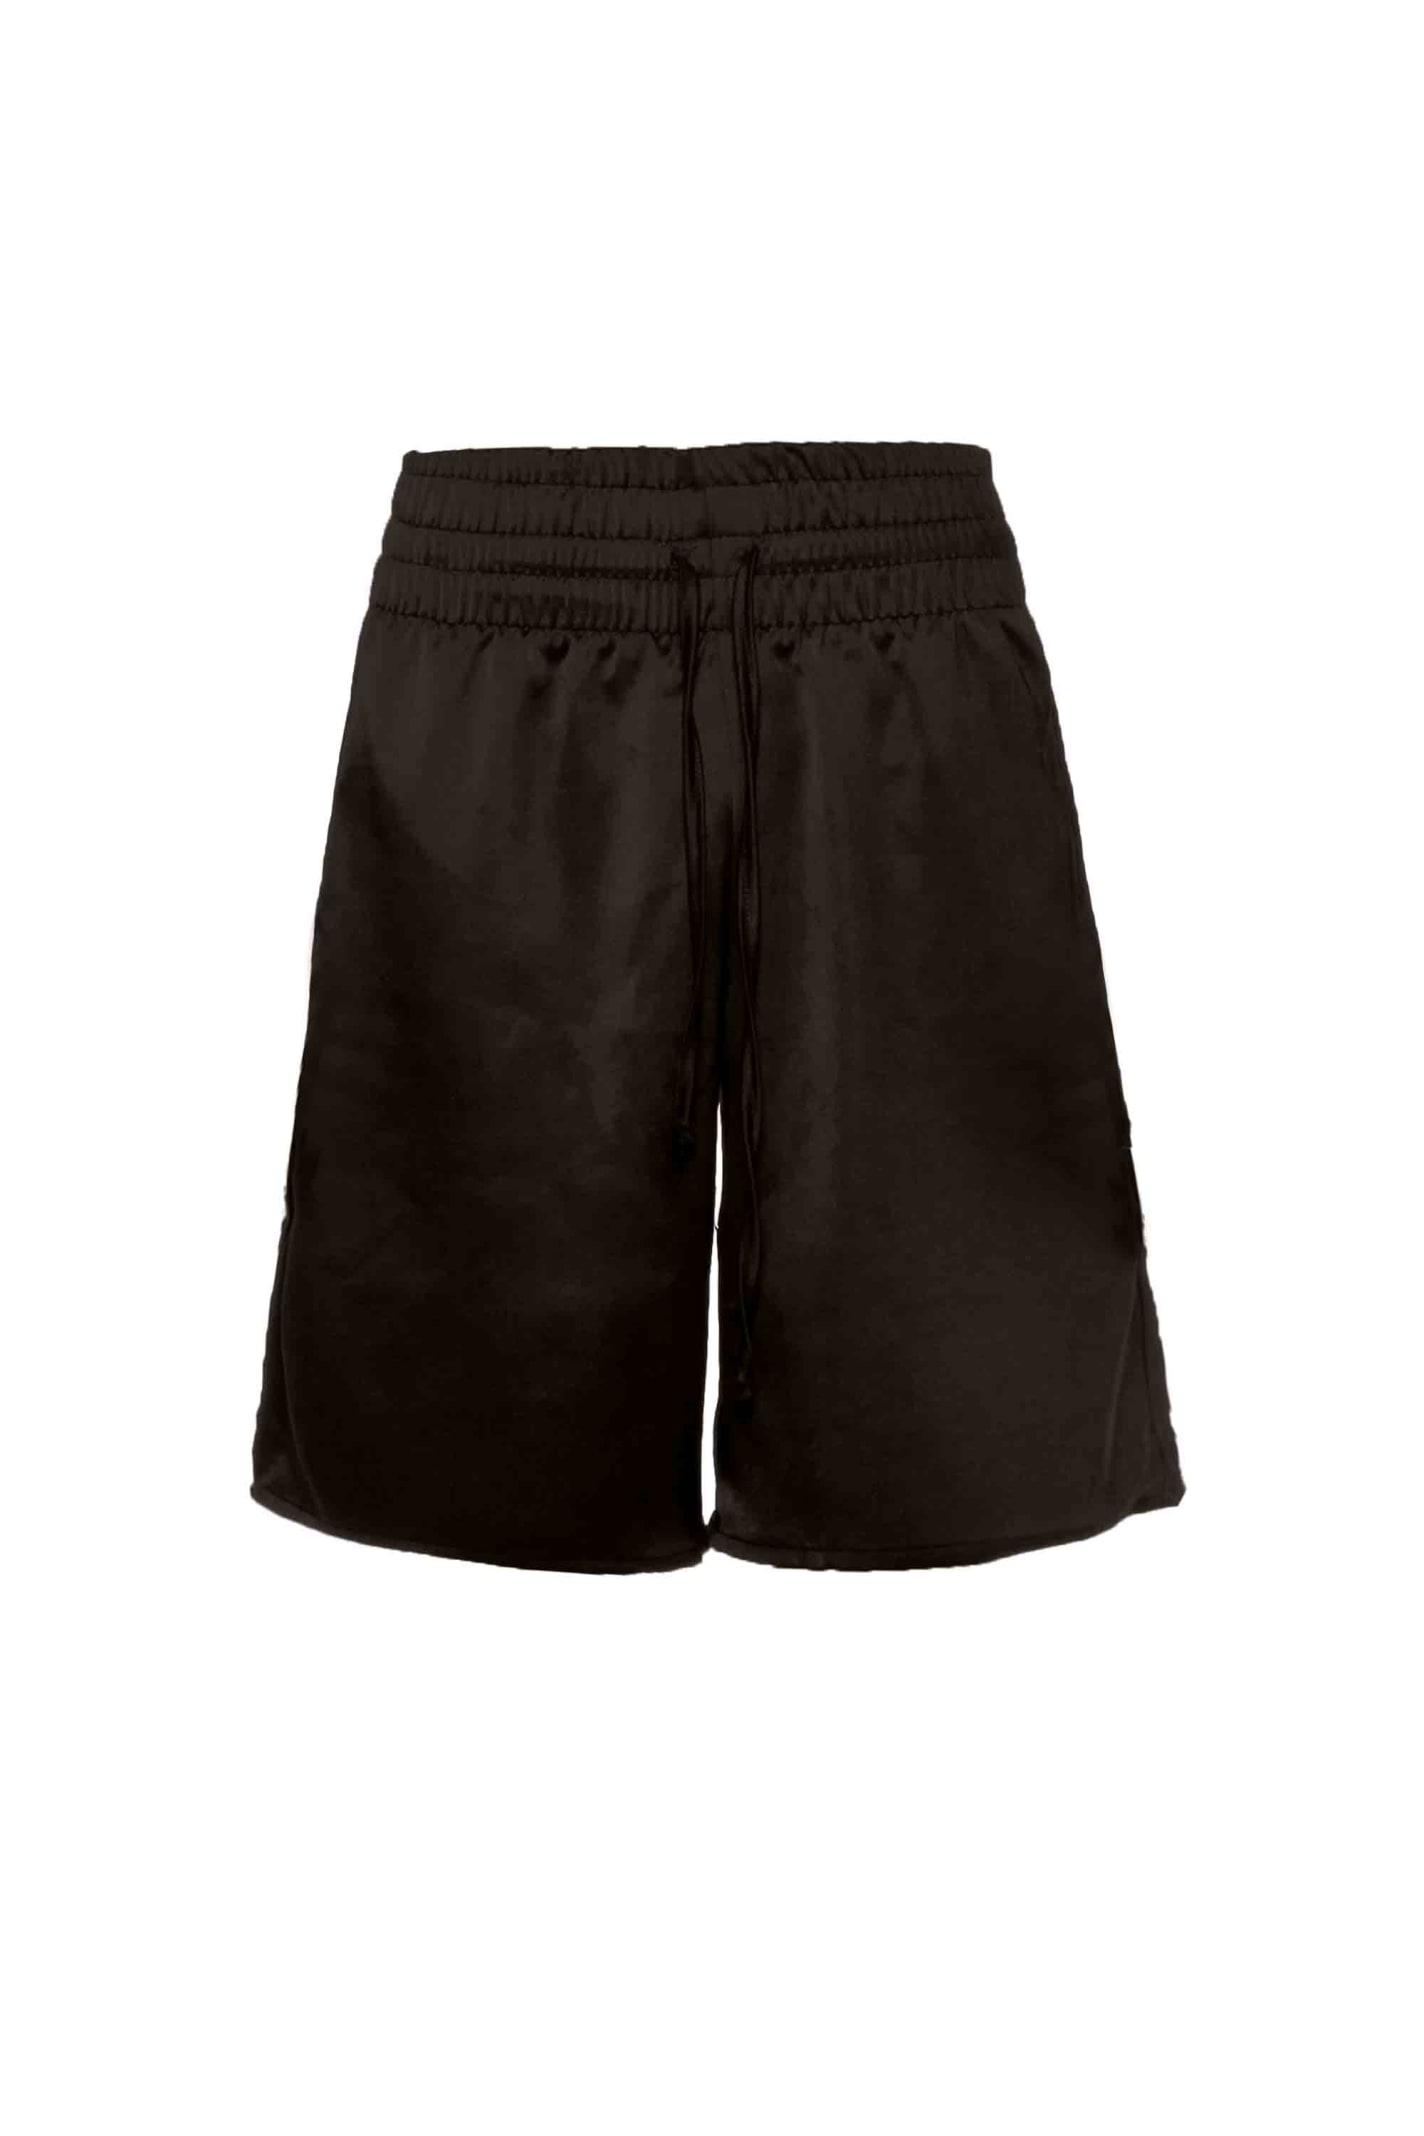 Pants Thai Boxe Nabucco Black